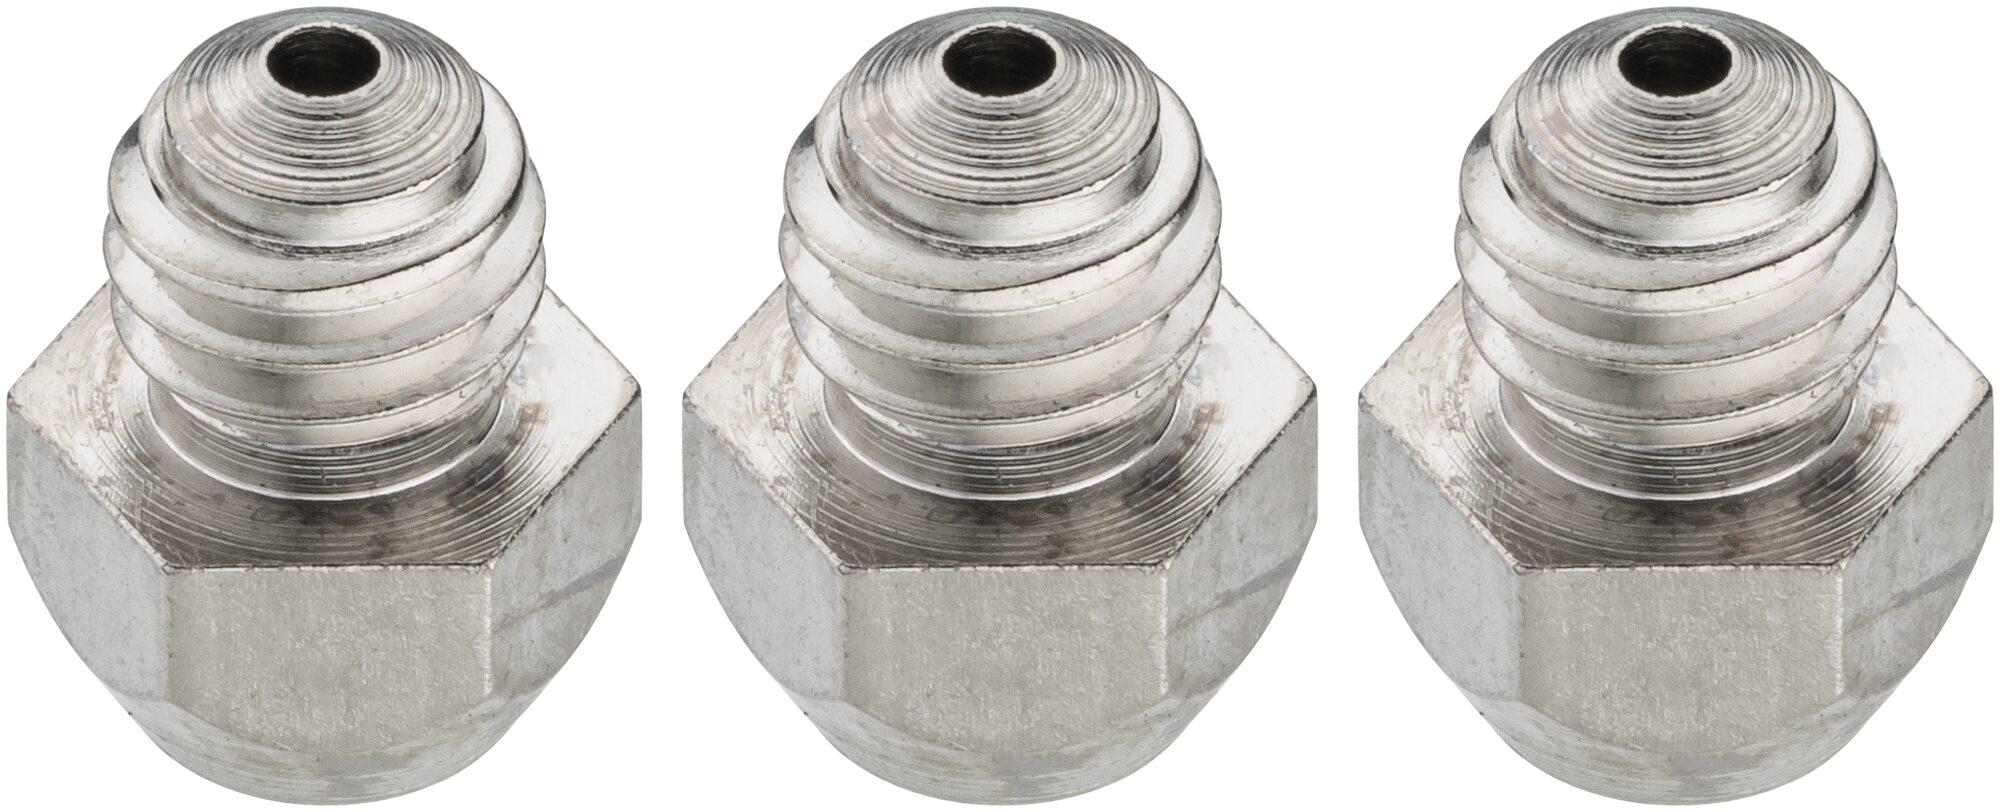 HAZET Mundstück ∙ 2,4mm (3⁄32″) 9037SPC-017/3